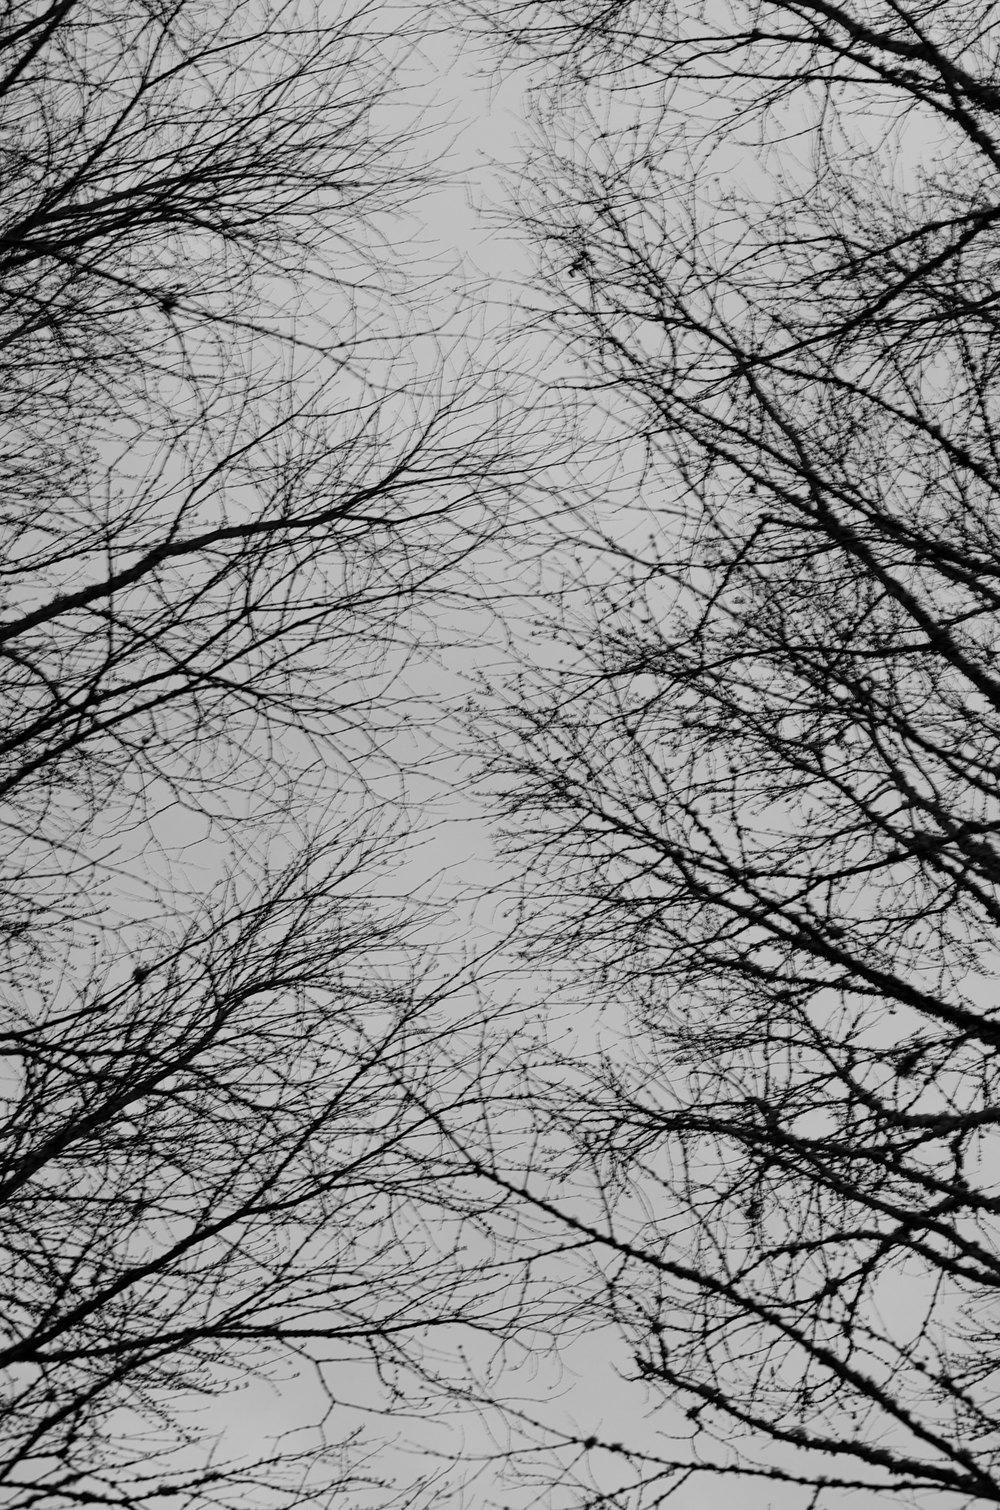 Portland-Trees-Branches-2-bw-casenruiz.jpg